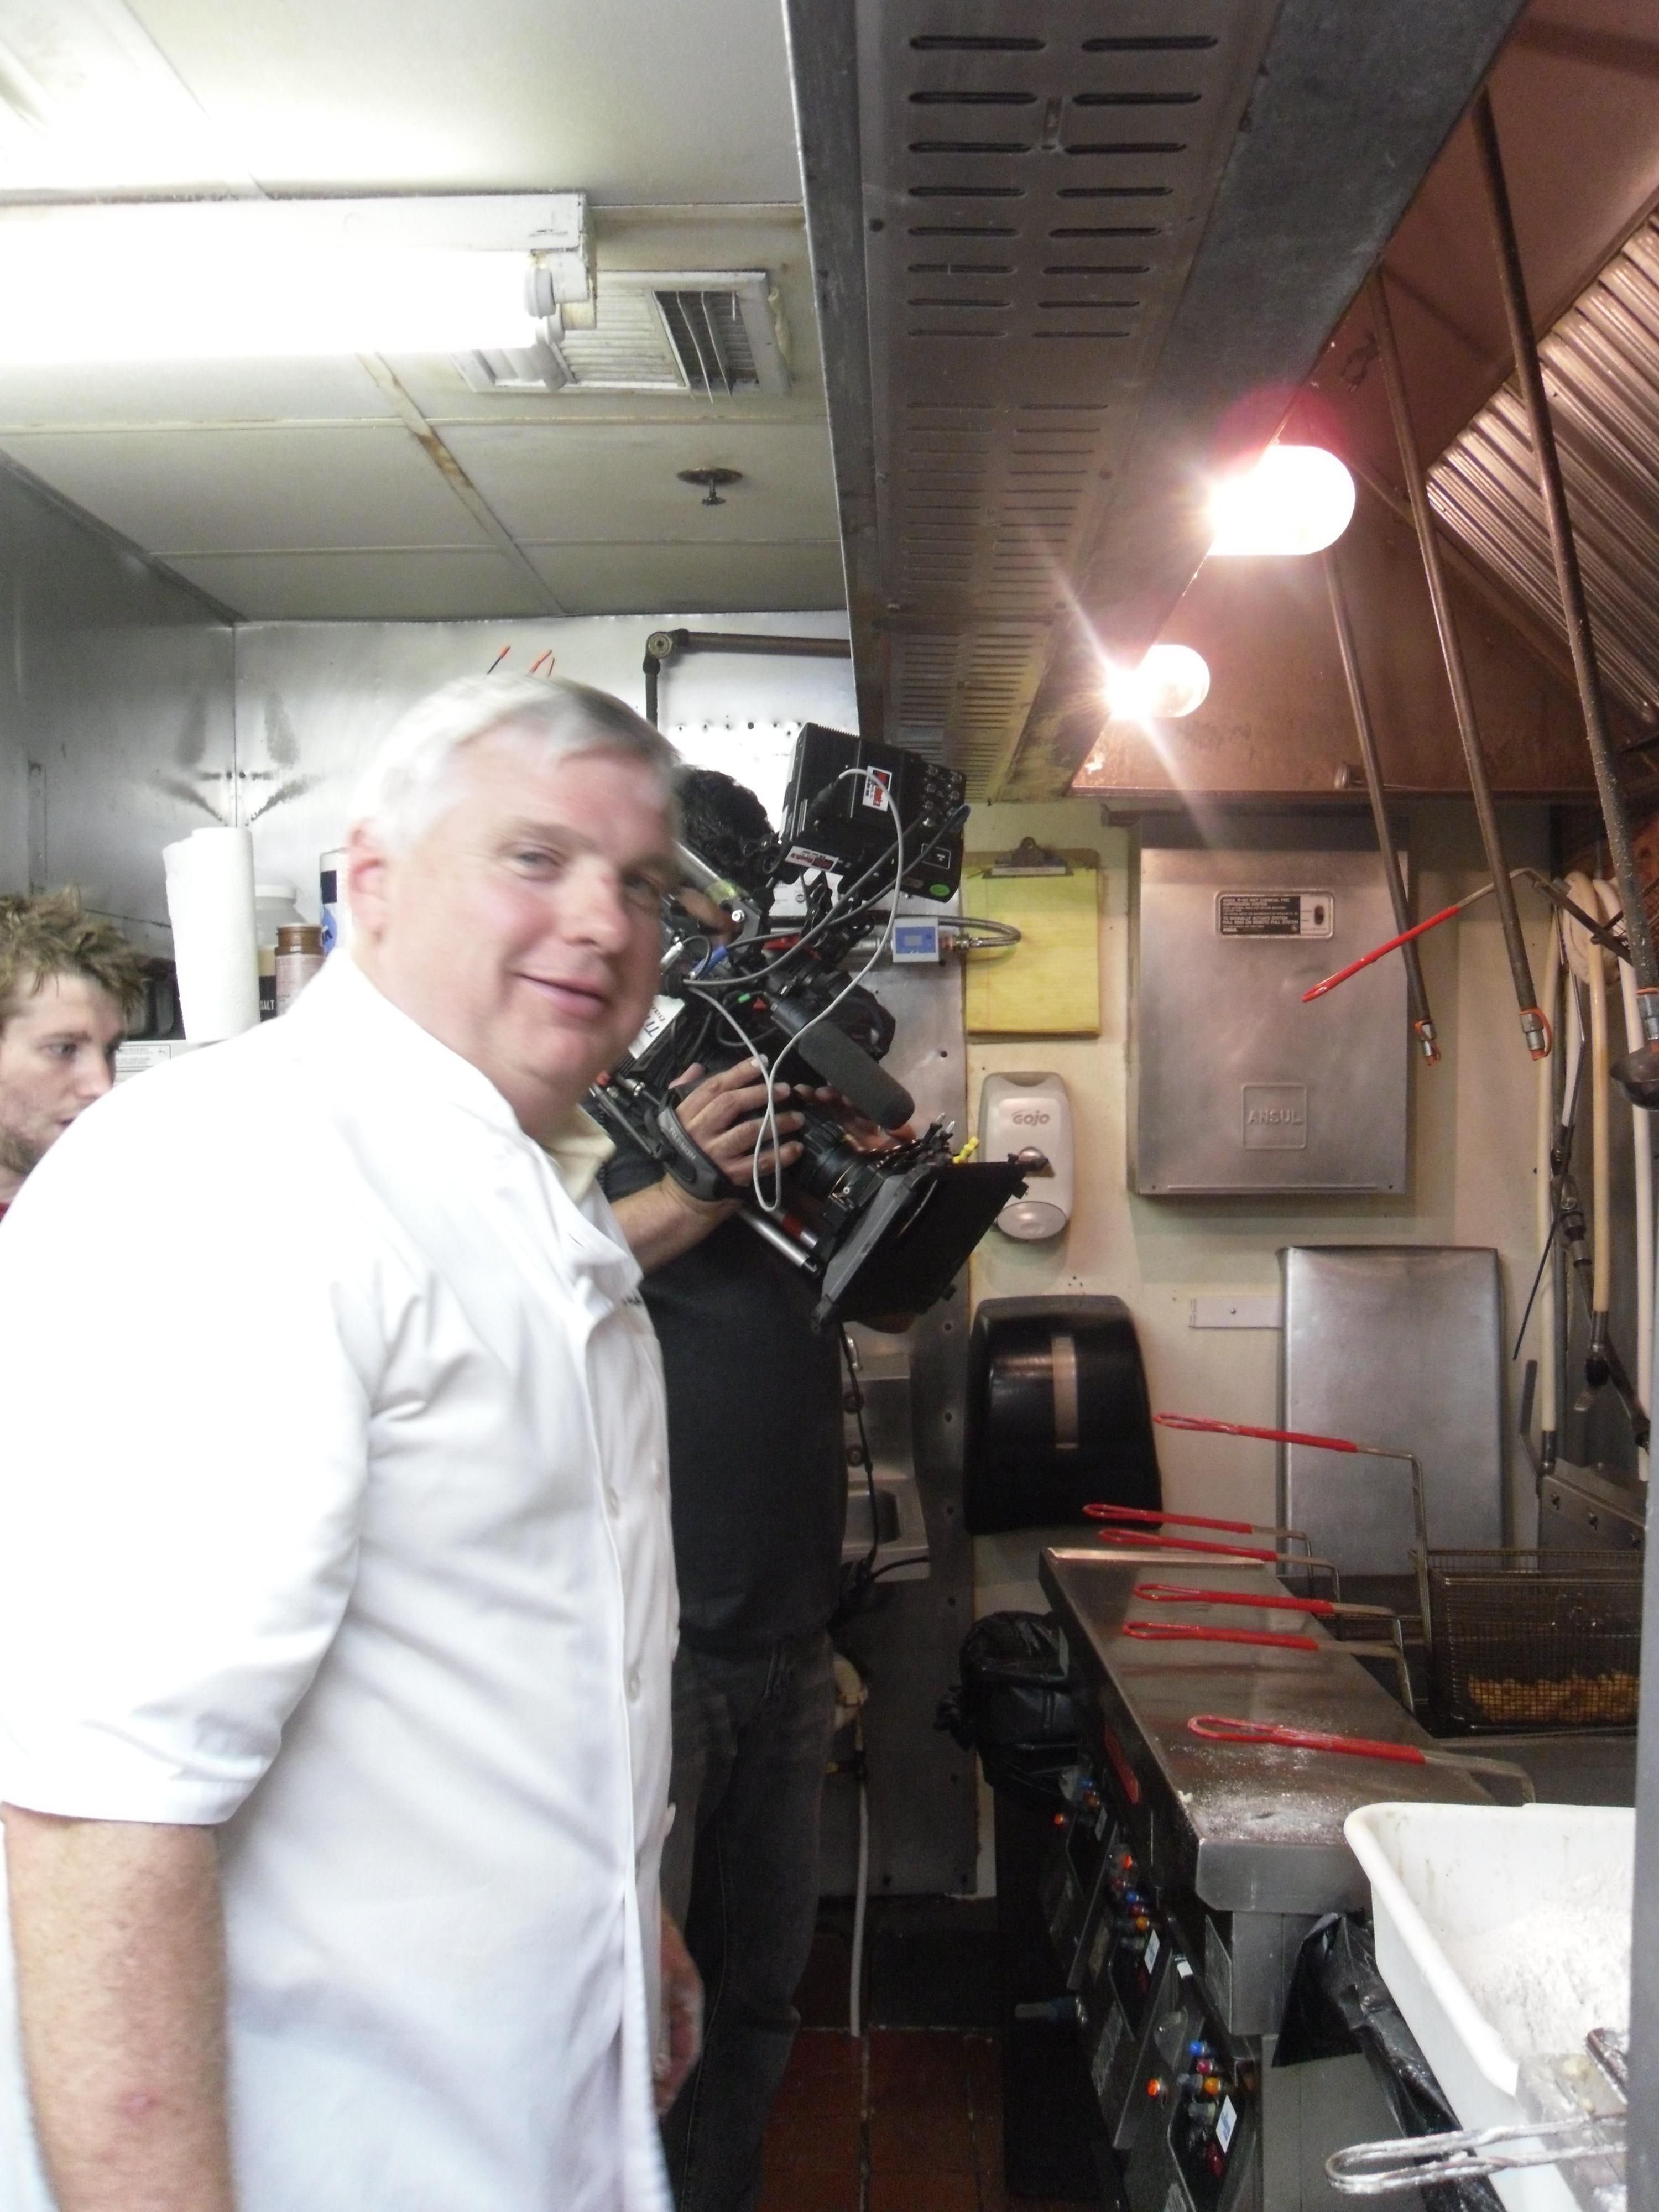 camera crew in OOH kitchen